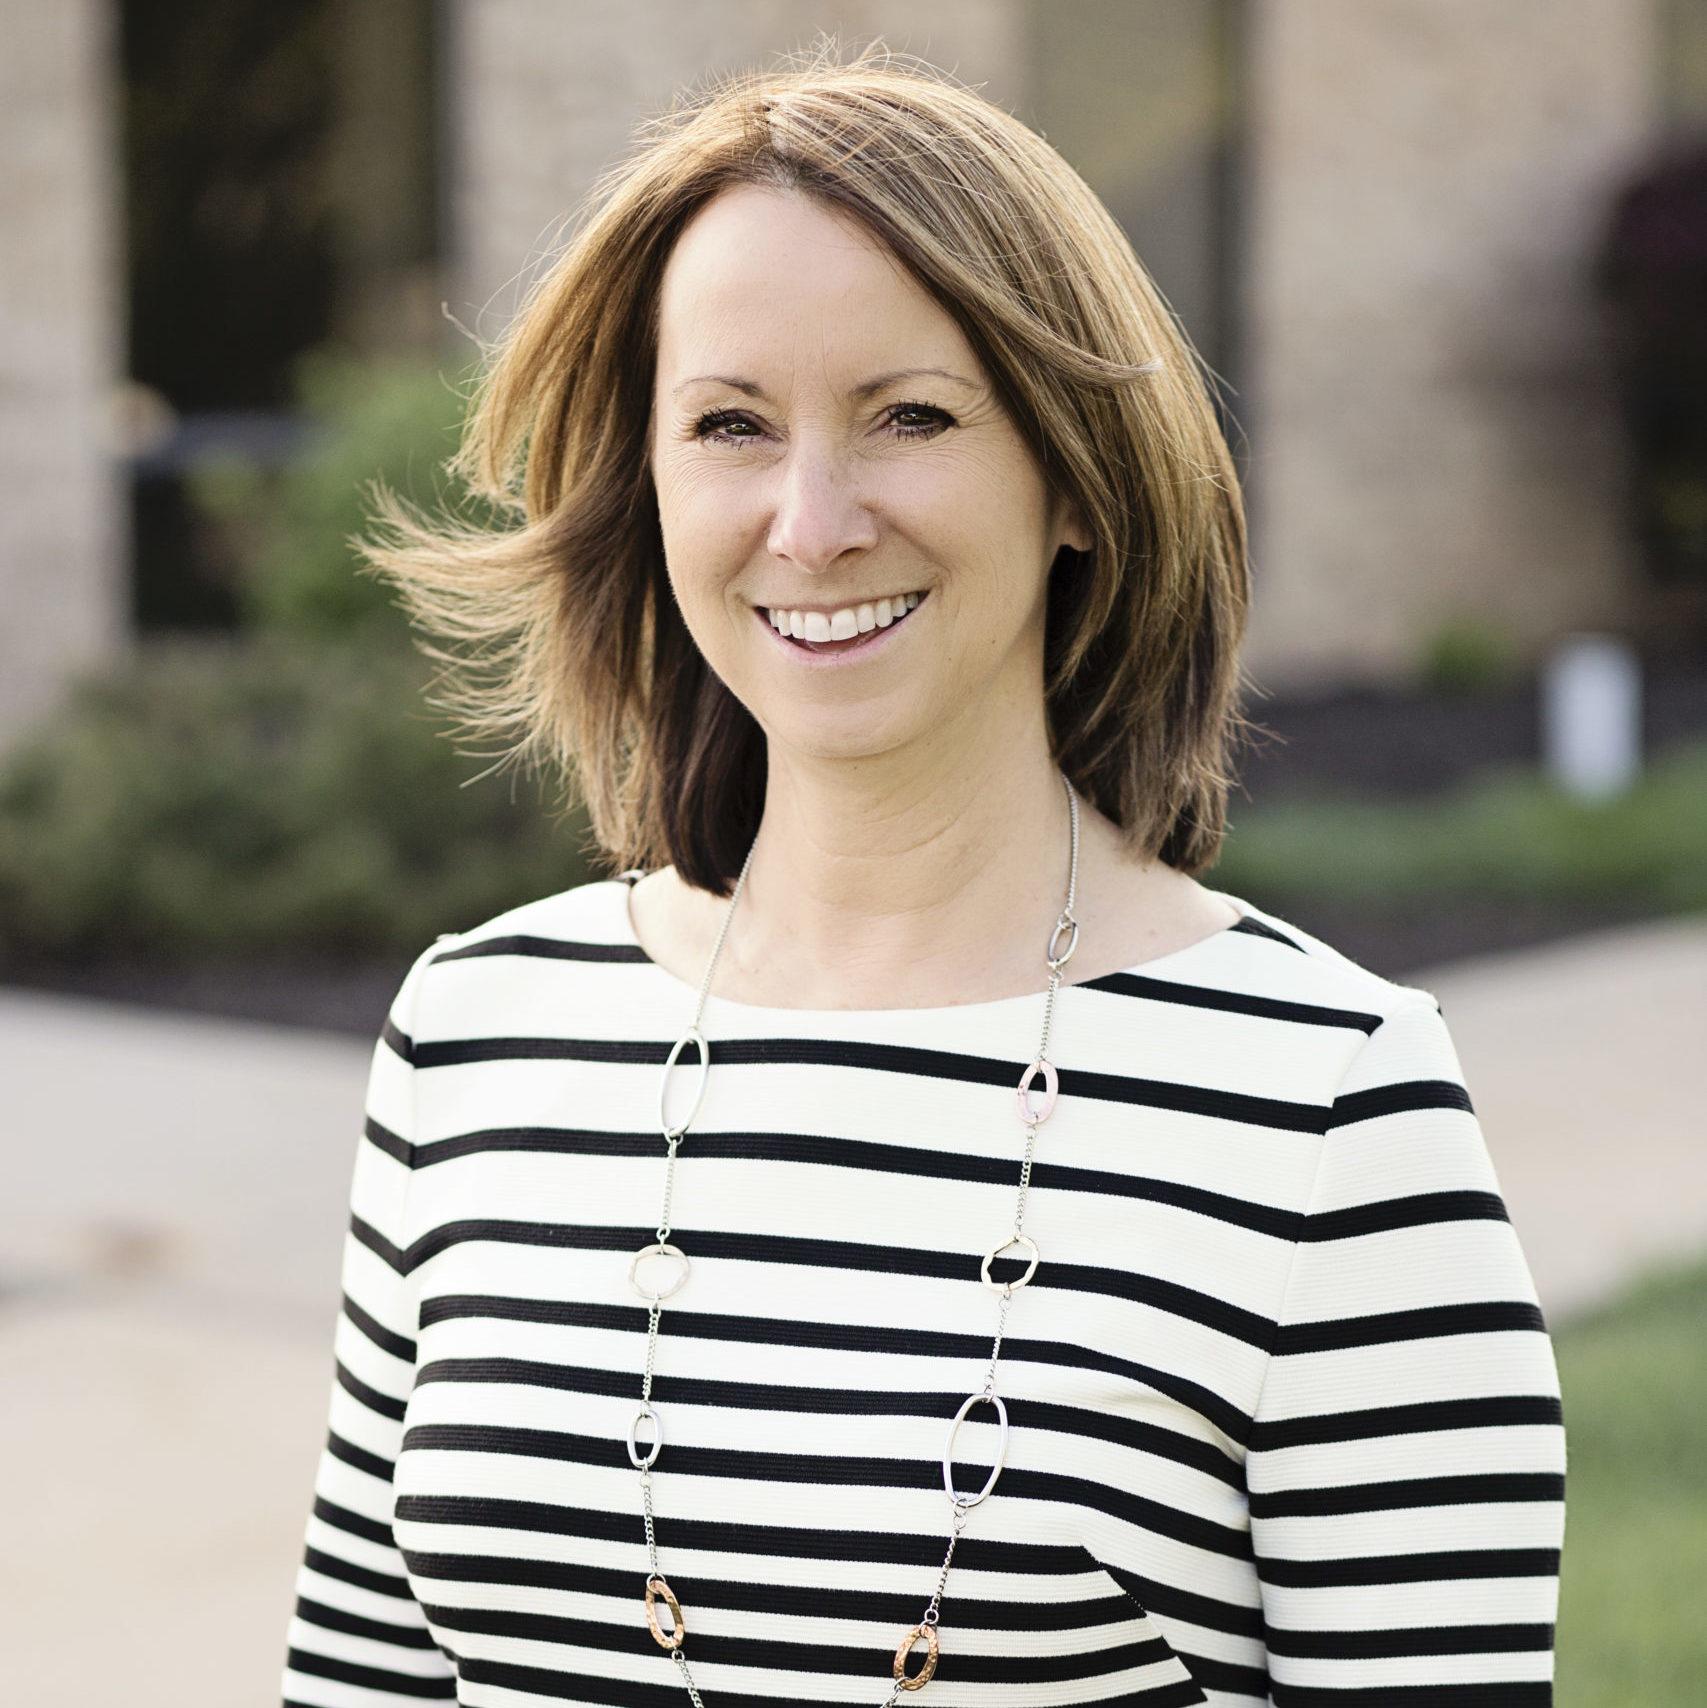 Kathy Shanks Executive Vice President headshot.